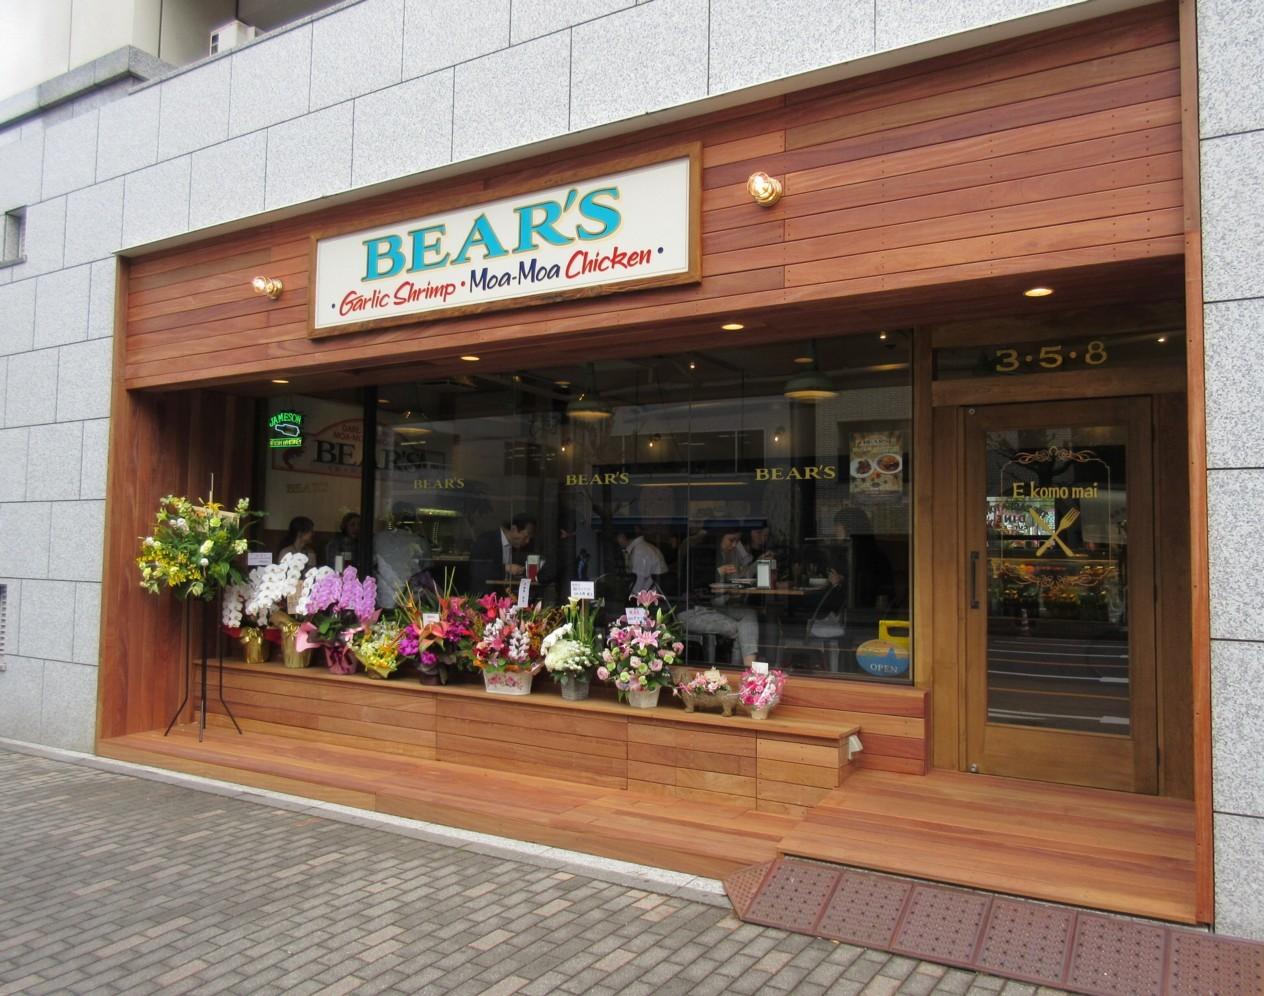 BEAR'S